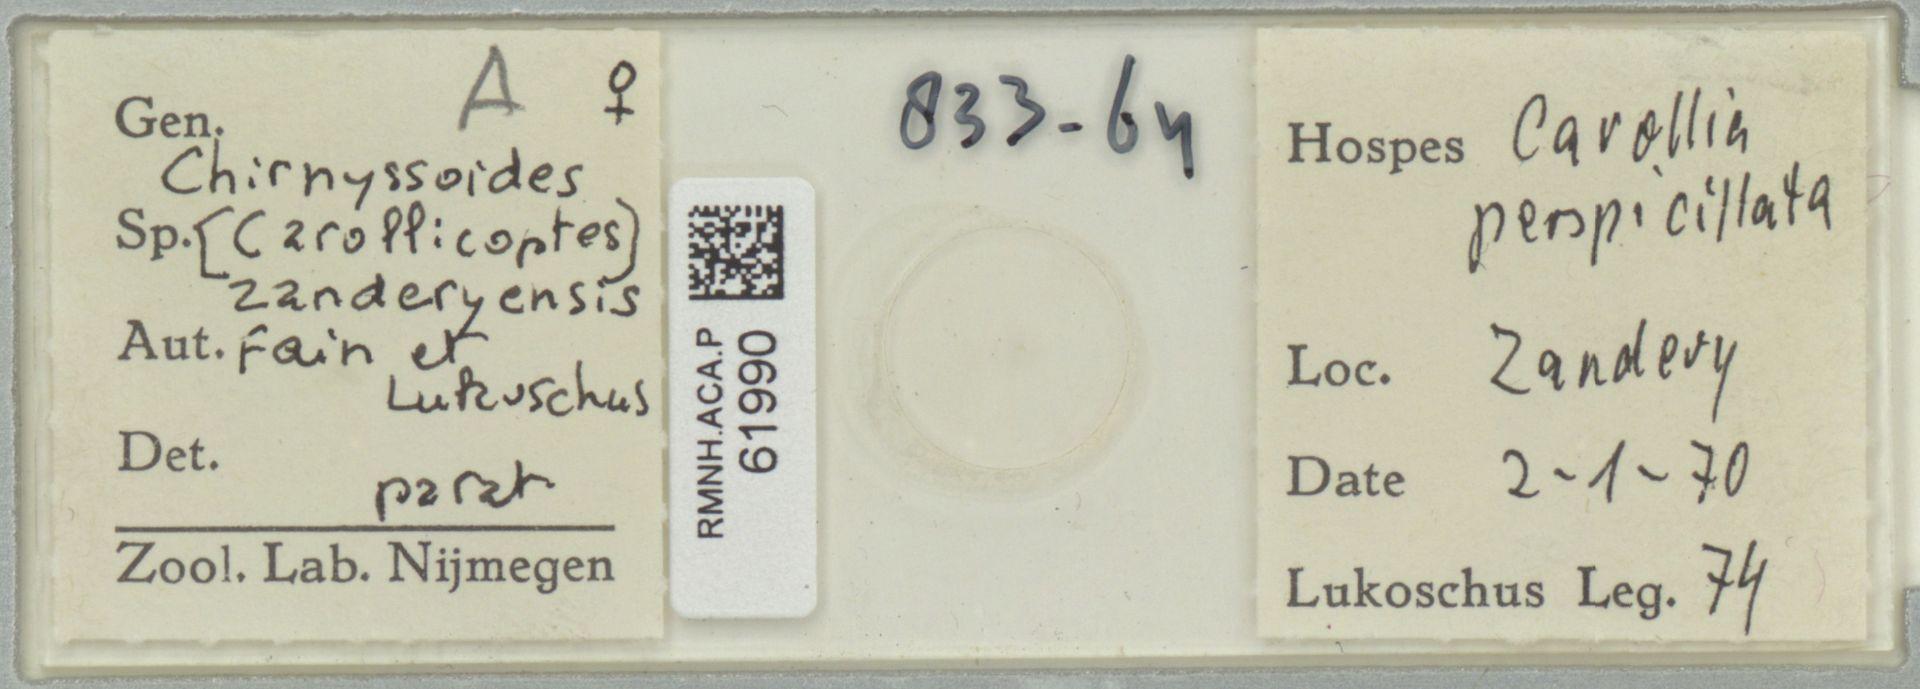 RMNH.ACA.P.61990 | Chirnyssoides (Carollicoptes) zanderyensis Fain & Lukoschus